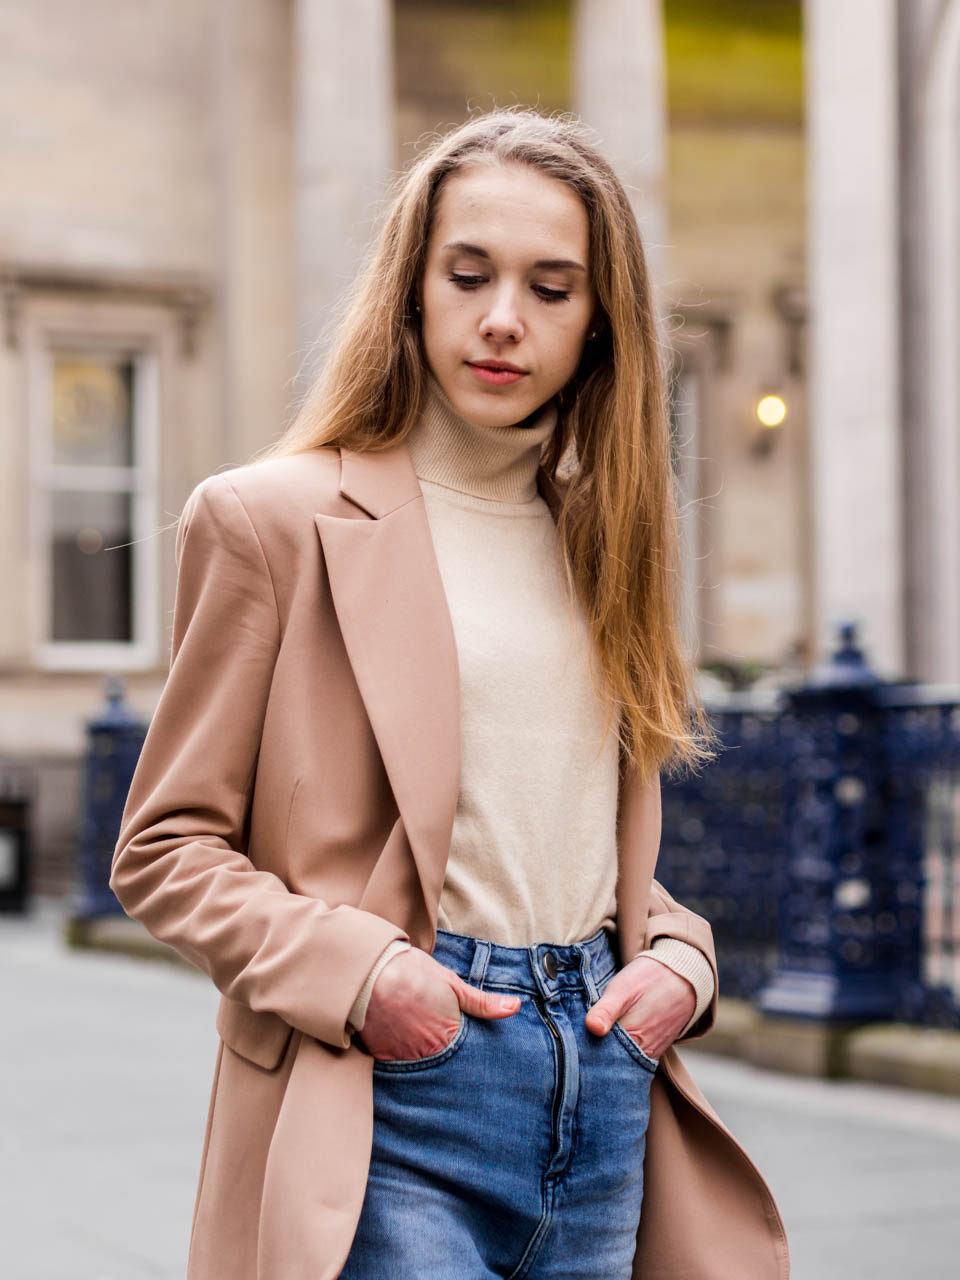 Autumn fashion :beige cashmere turtleneck jumper and camel blazer - Syysmuoti: beige kasmirpooloneule ja kamelinvärinen bleiseri